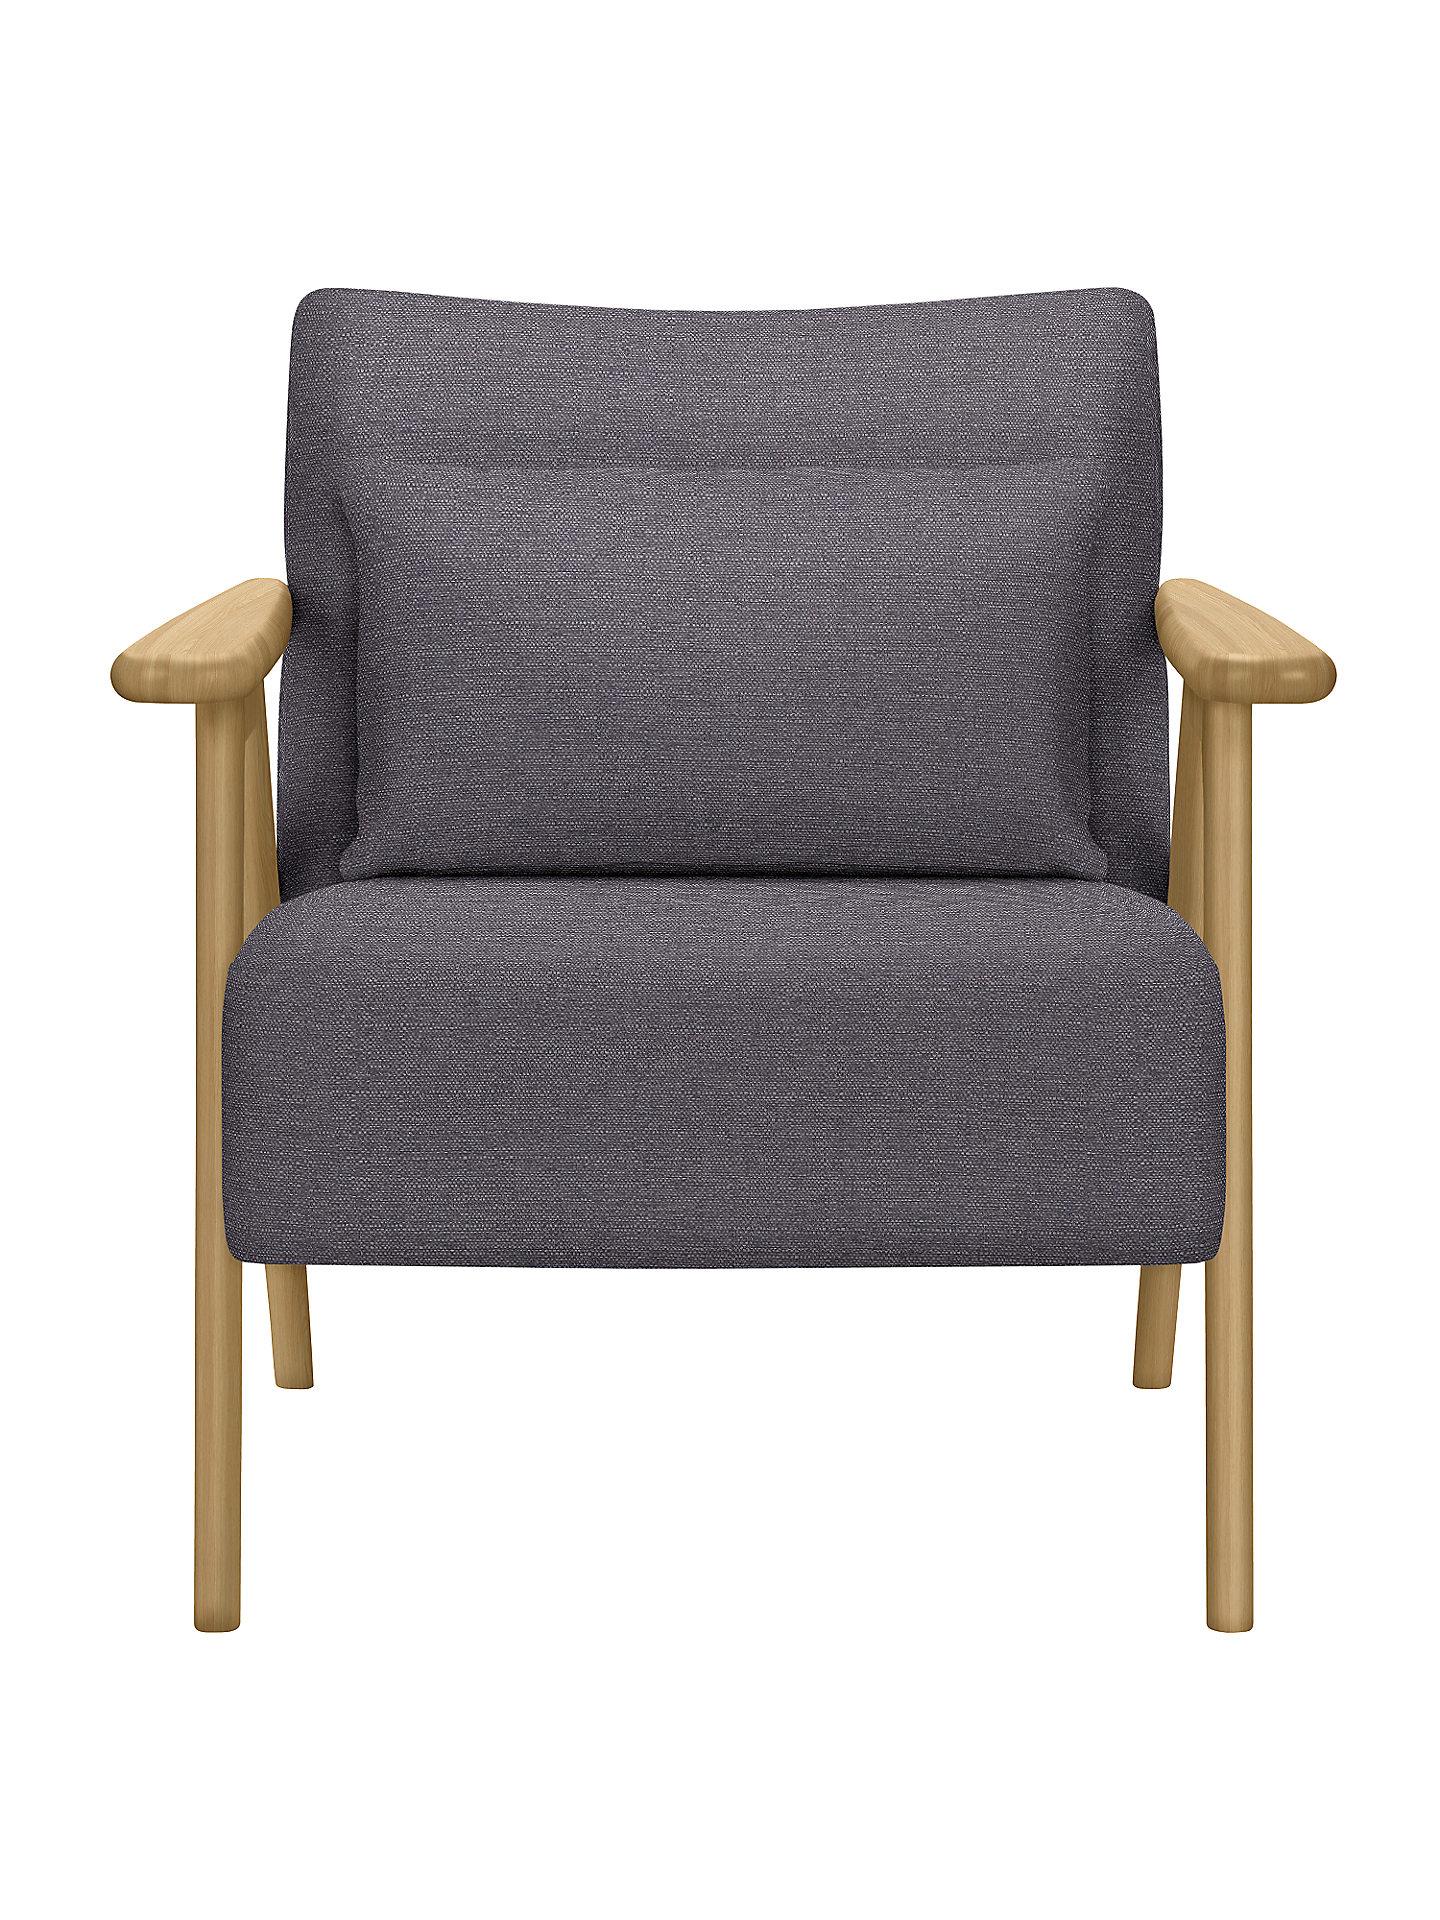 Fabulous John Lewis Partners Hendricks Accent Chair Forskolin Free Trial Chair Design Images Forskolin Free Trialorg